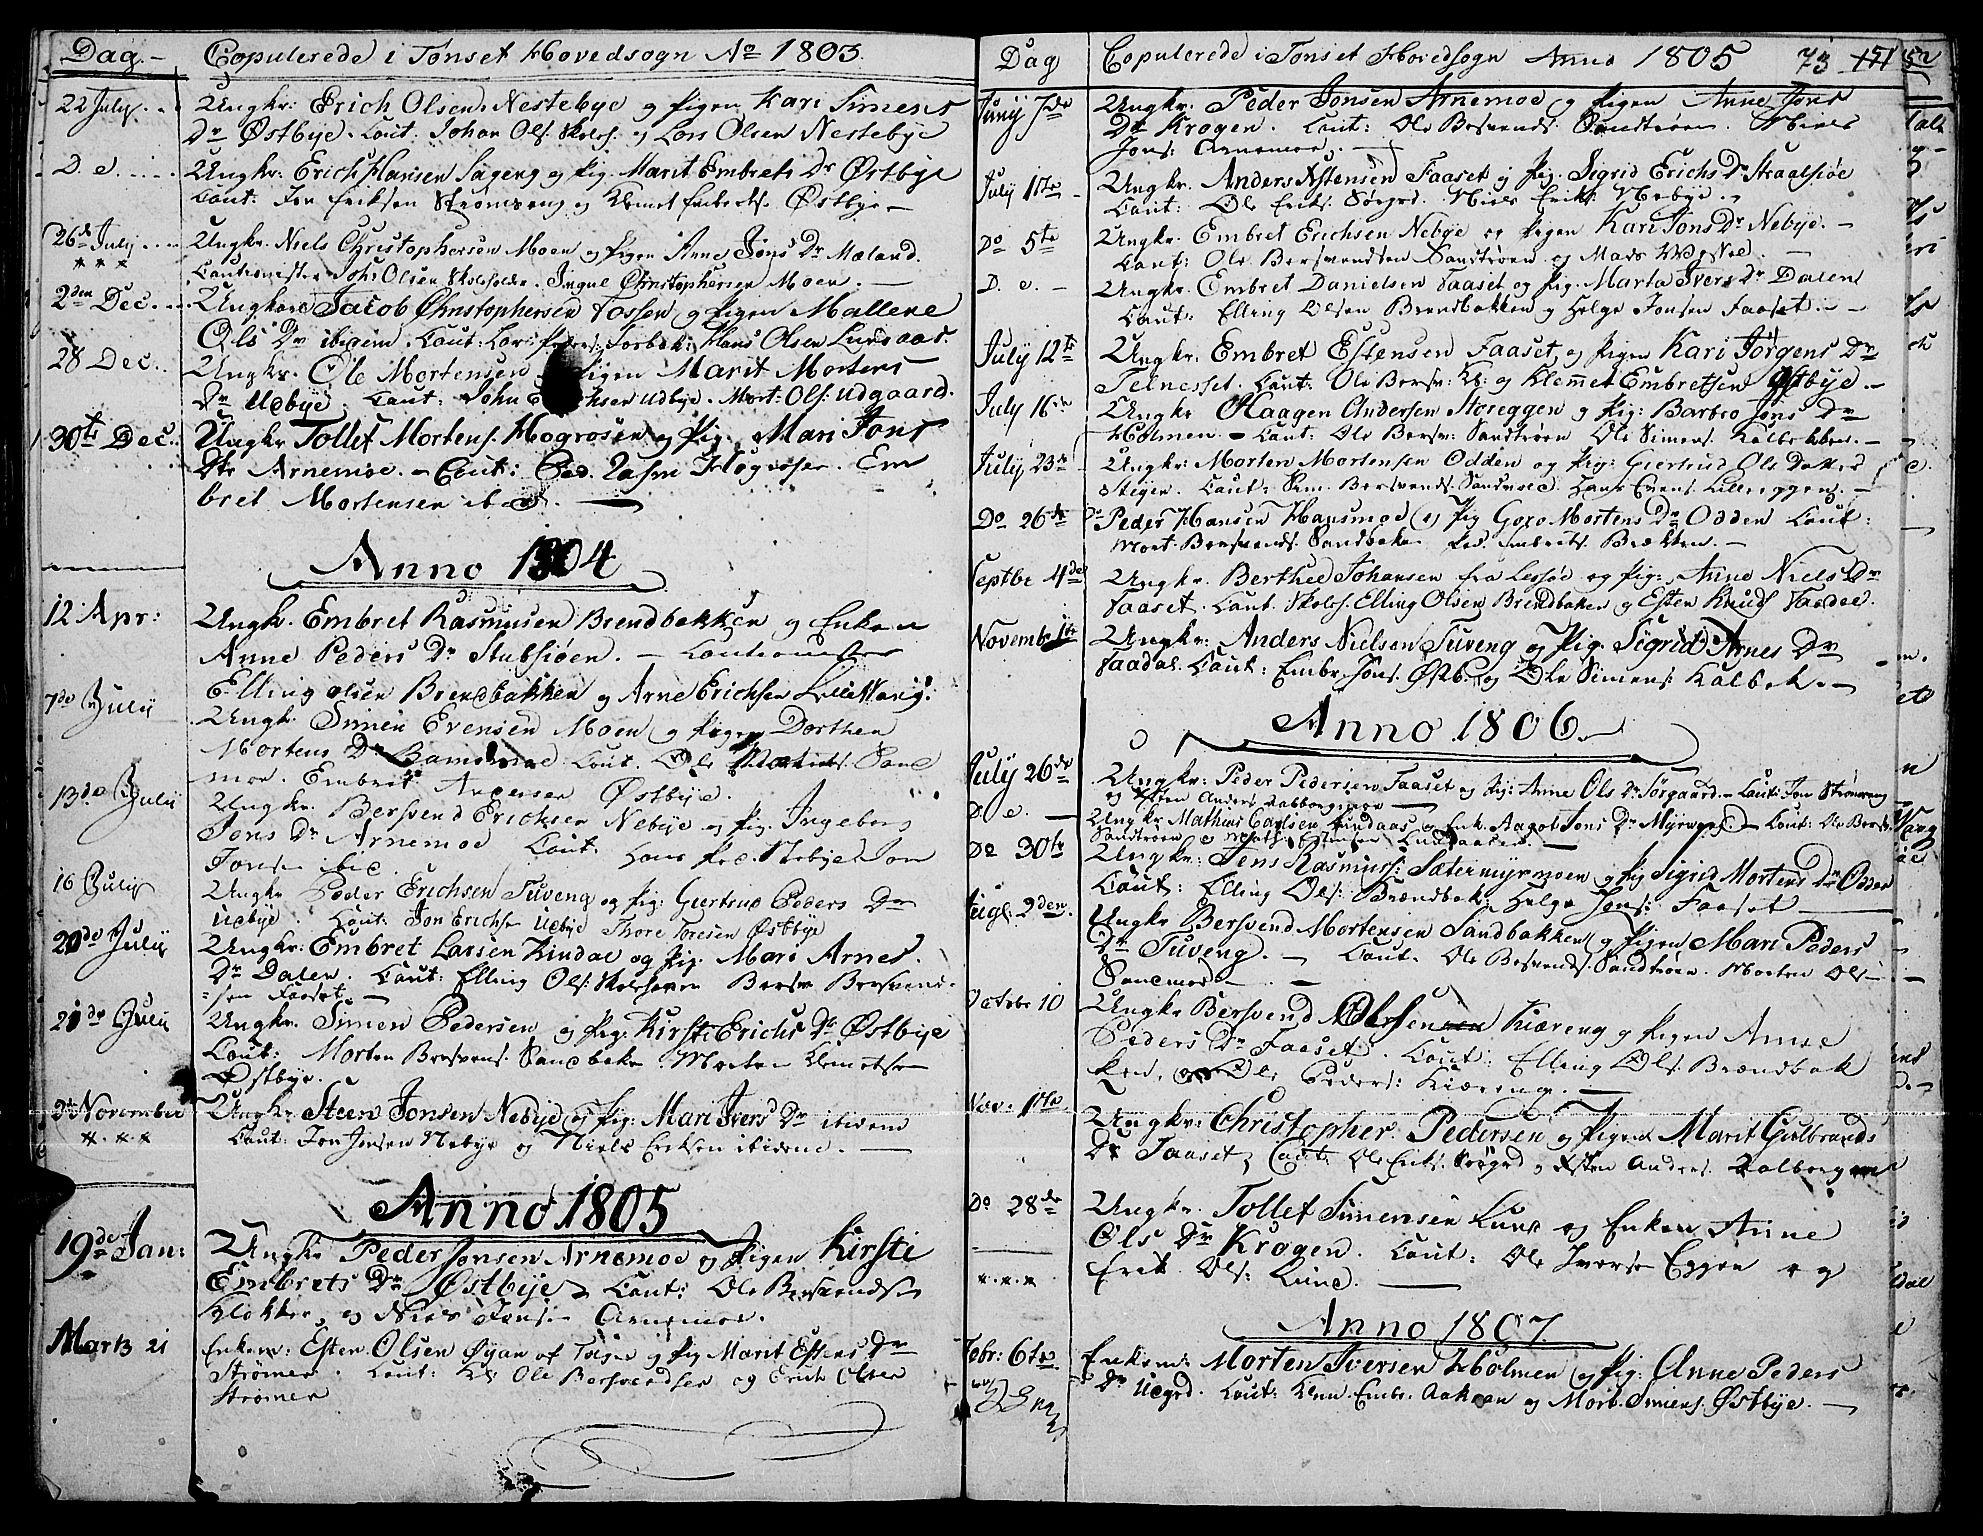 SAH, Tynset prestekontor, Ministerialbok nr. 15, 1801-1814, s. 73